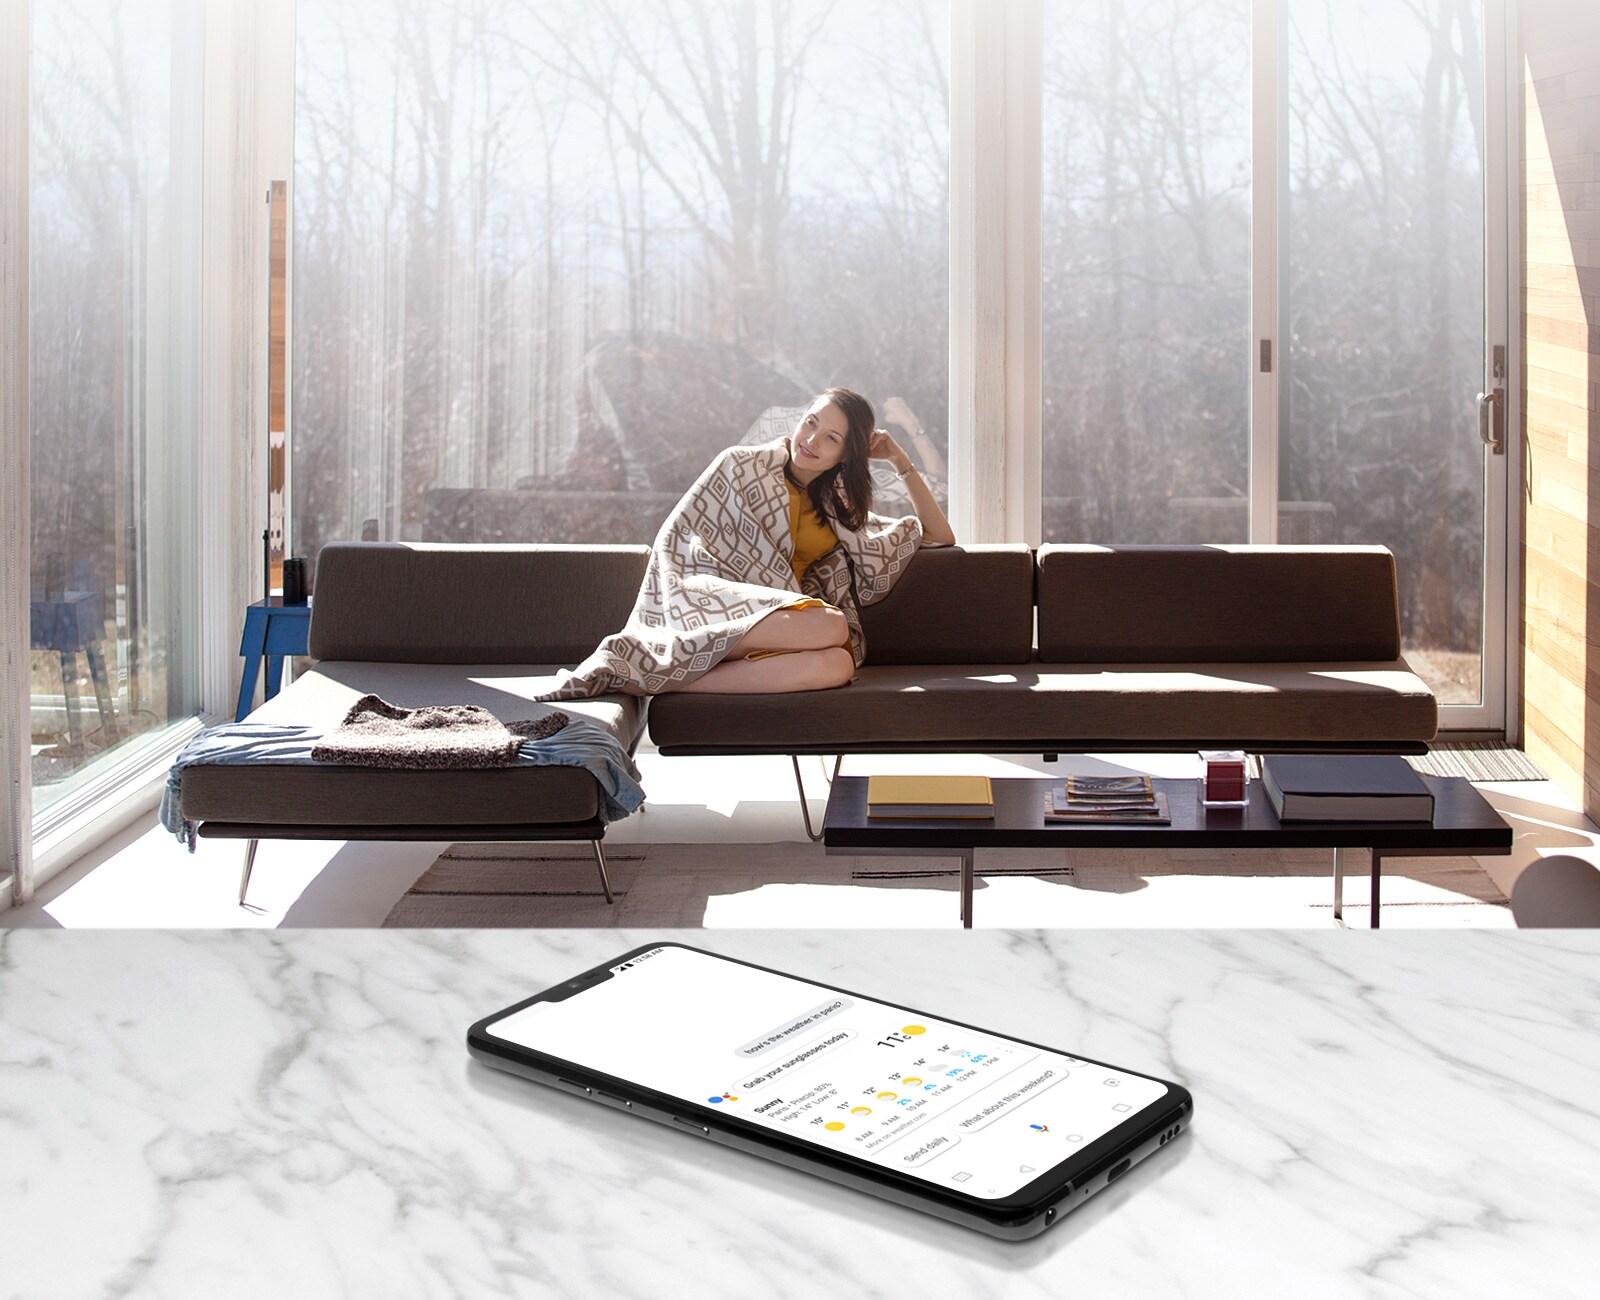 LG G7 ThinQ Распознавание речи на увеличенном расстоянии